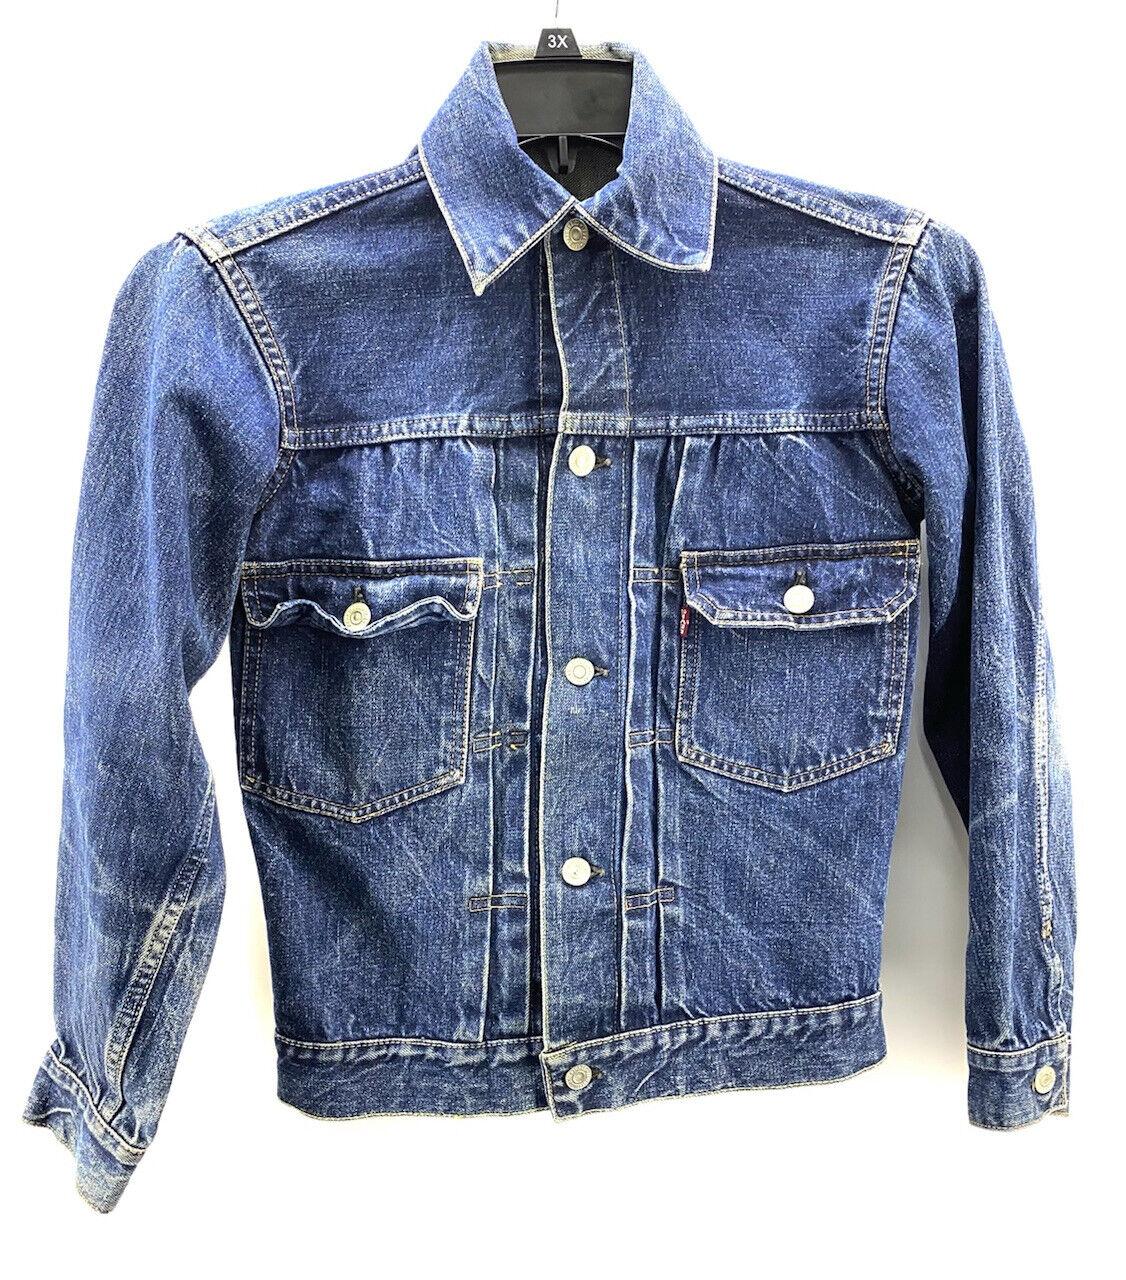 vtg levis type 2 1950's denim jacket Big E Origin… - image 1